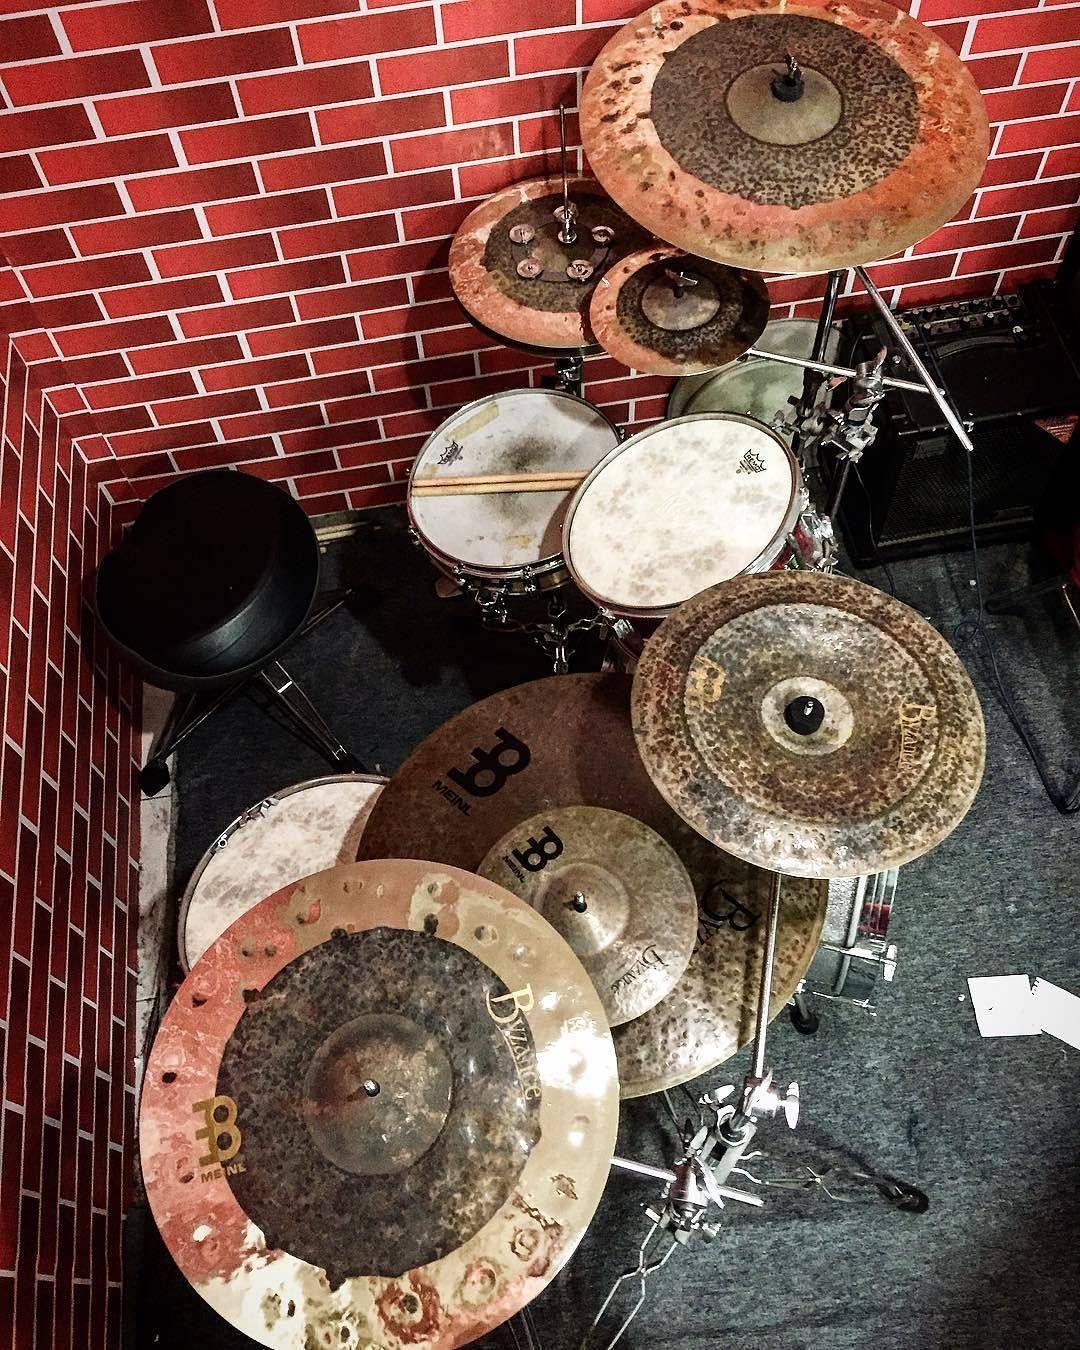 pin by darren williams on drum stuff in 2019 drums snare drum drums art. Black Bedroom Furniture Sets. Home Design Ideas